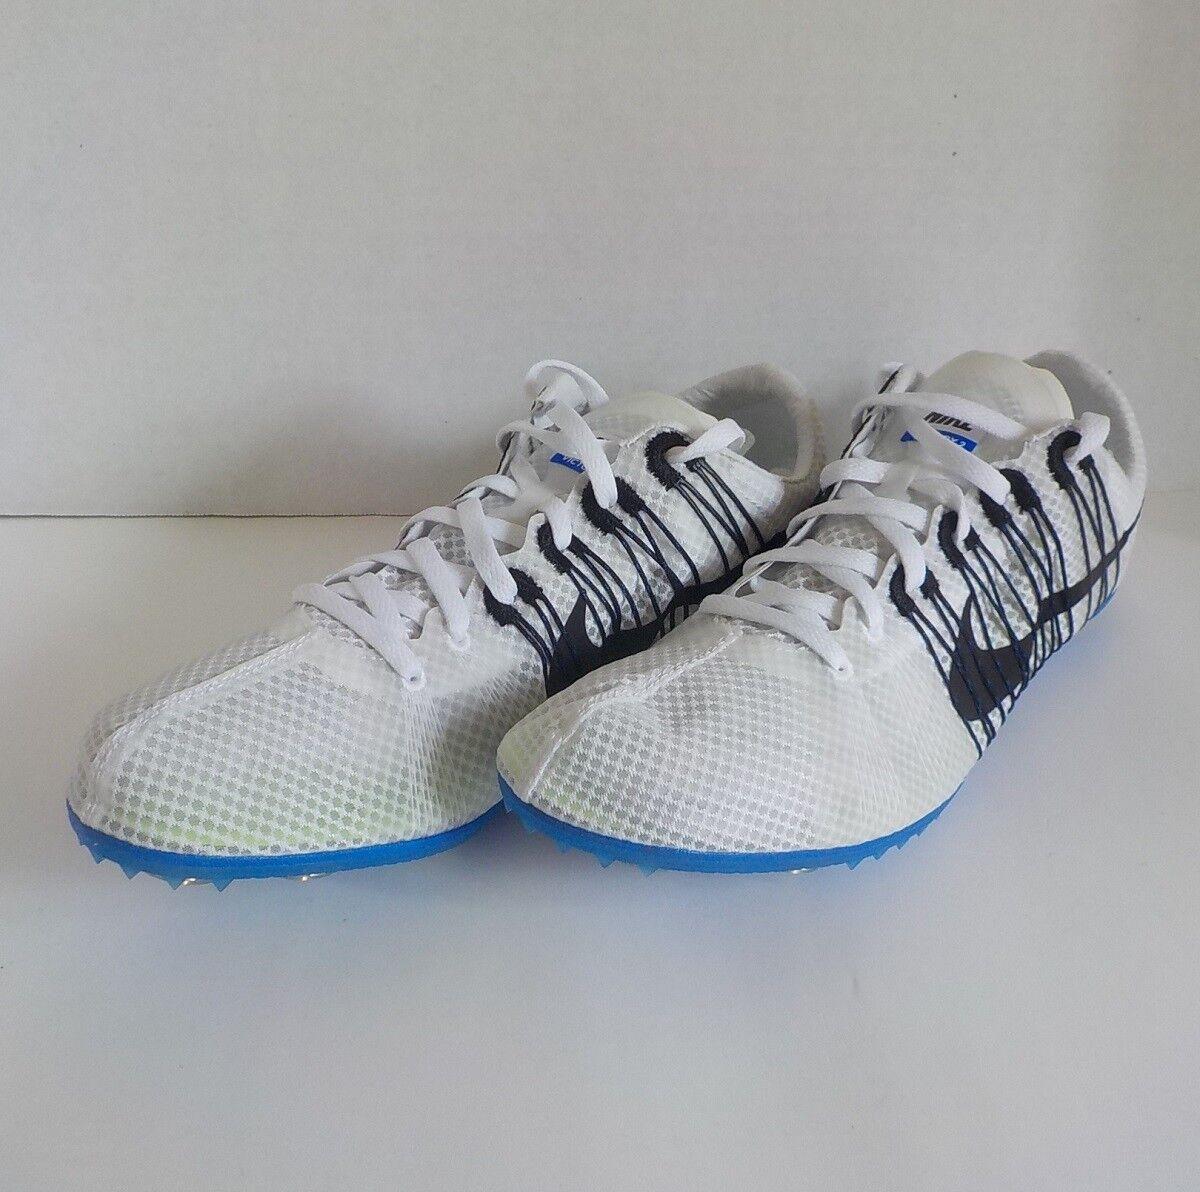 Nike VICTORY 2 Distance Running Chaussures Bleu 555365 100 Hommes 10.5 +Spikes &SRT